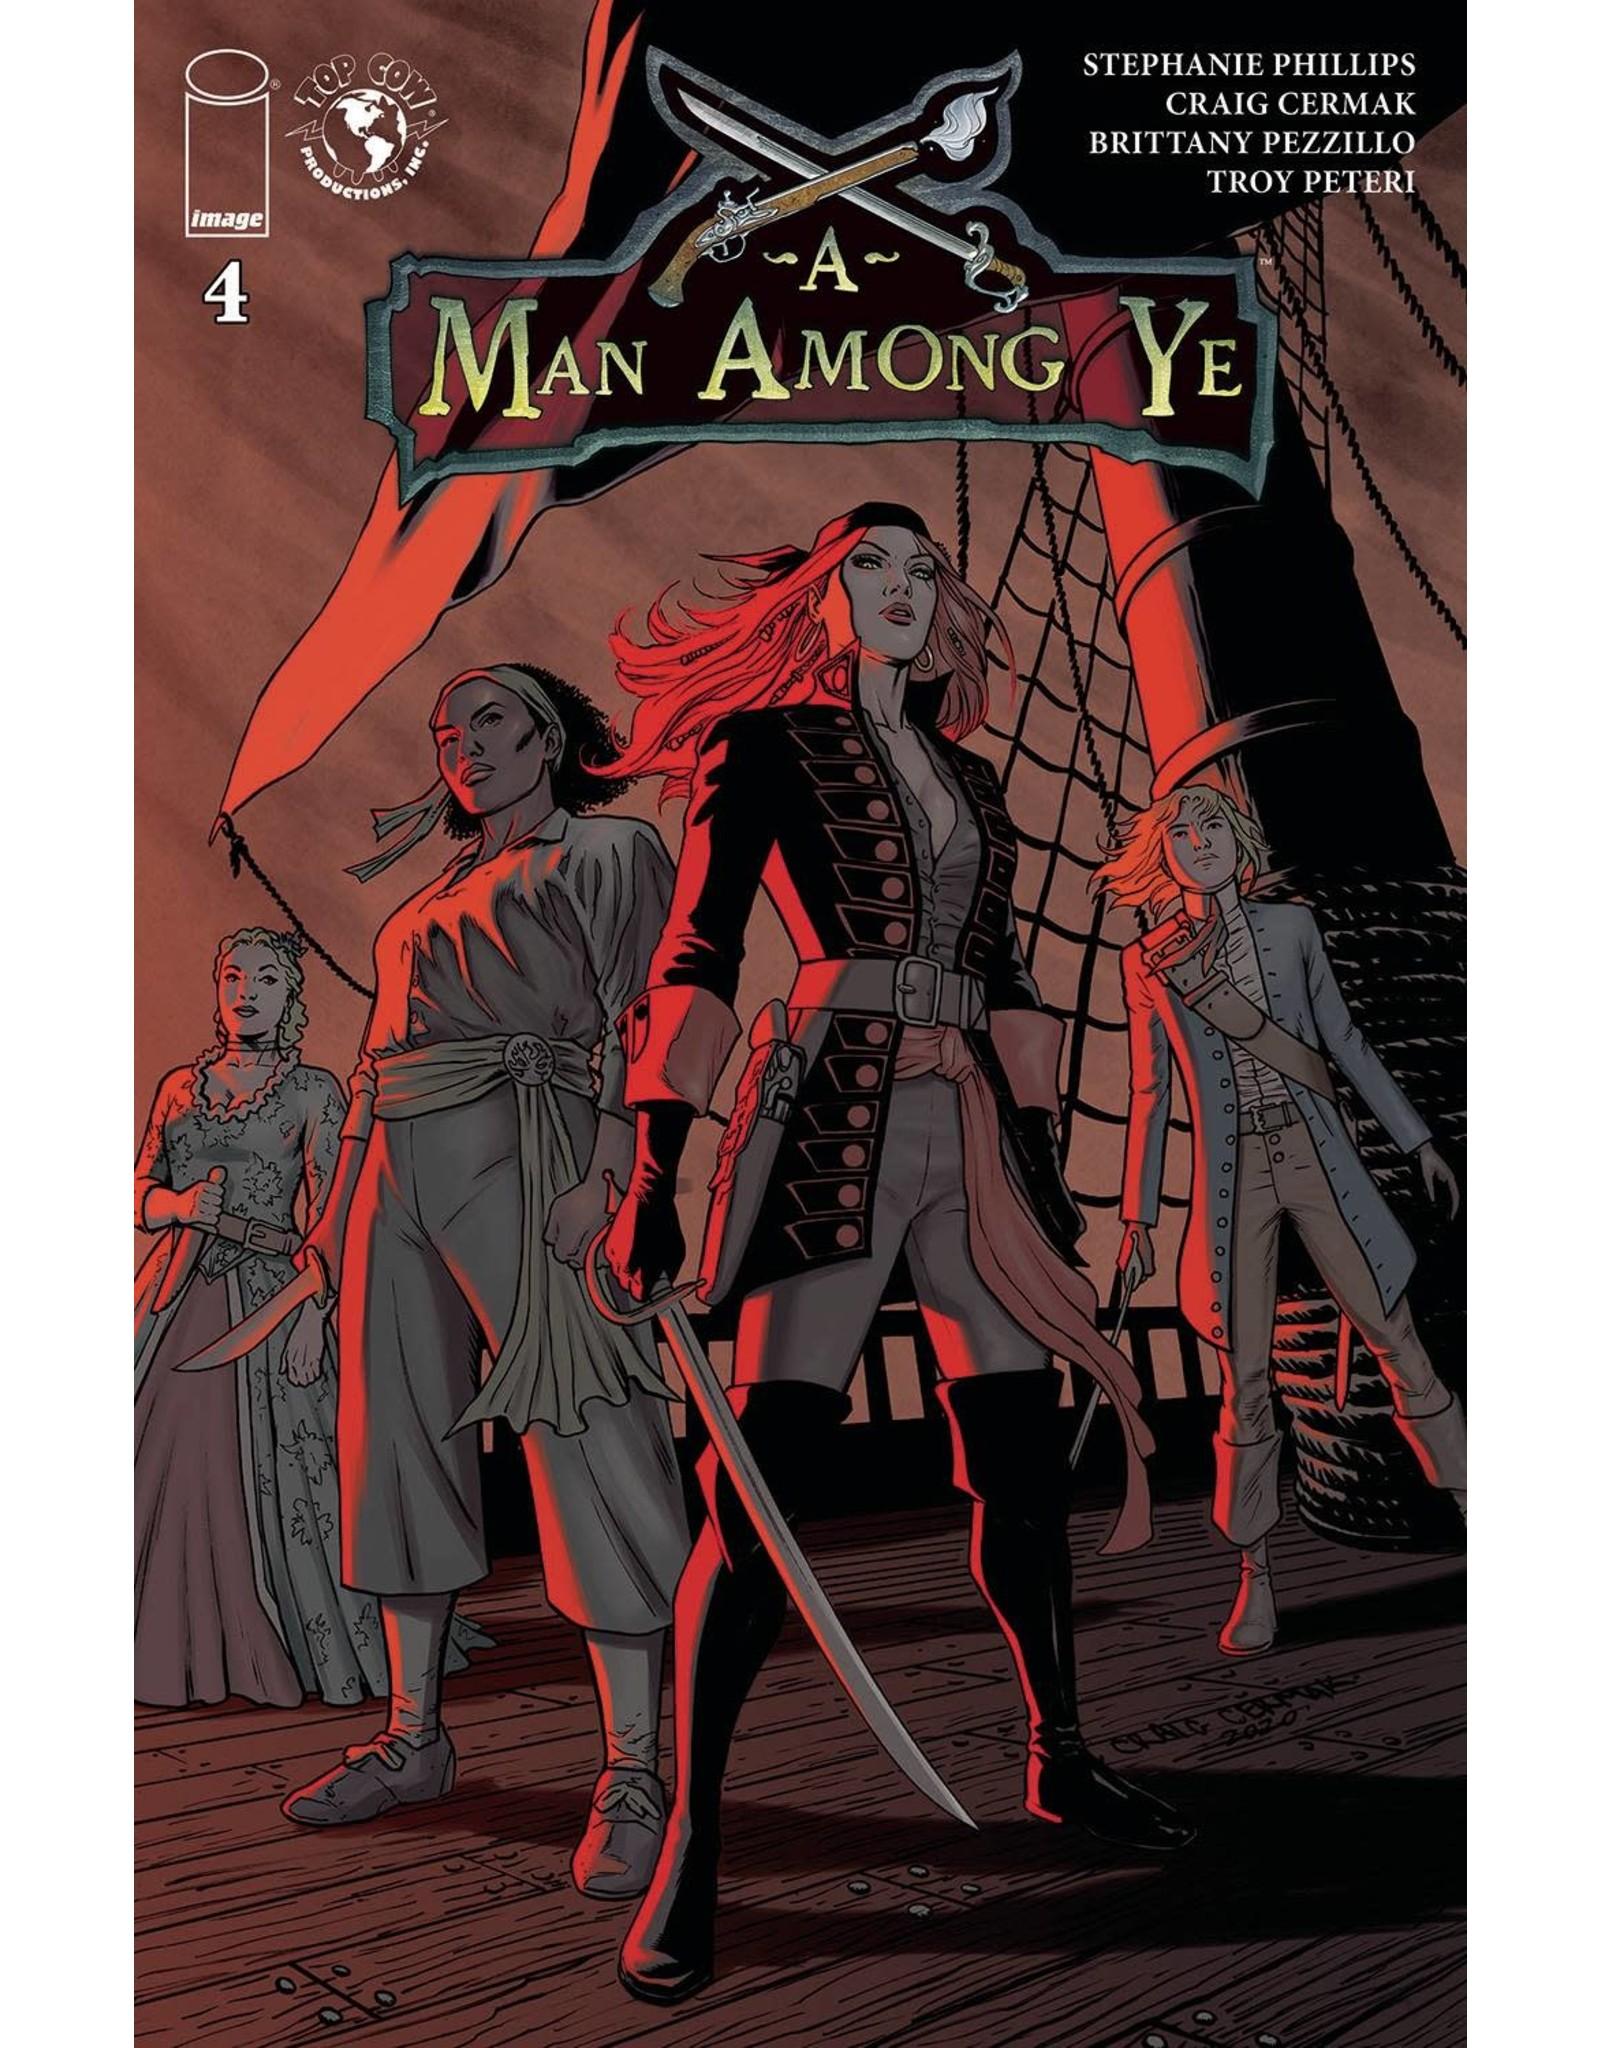 Image Comics A MAN AMONG YE #4